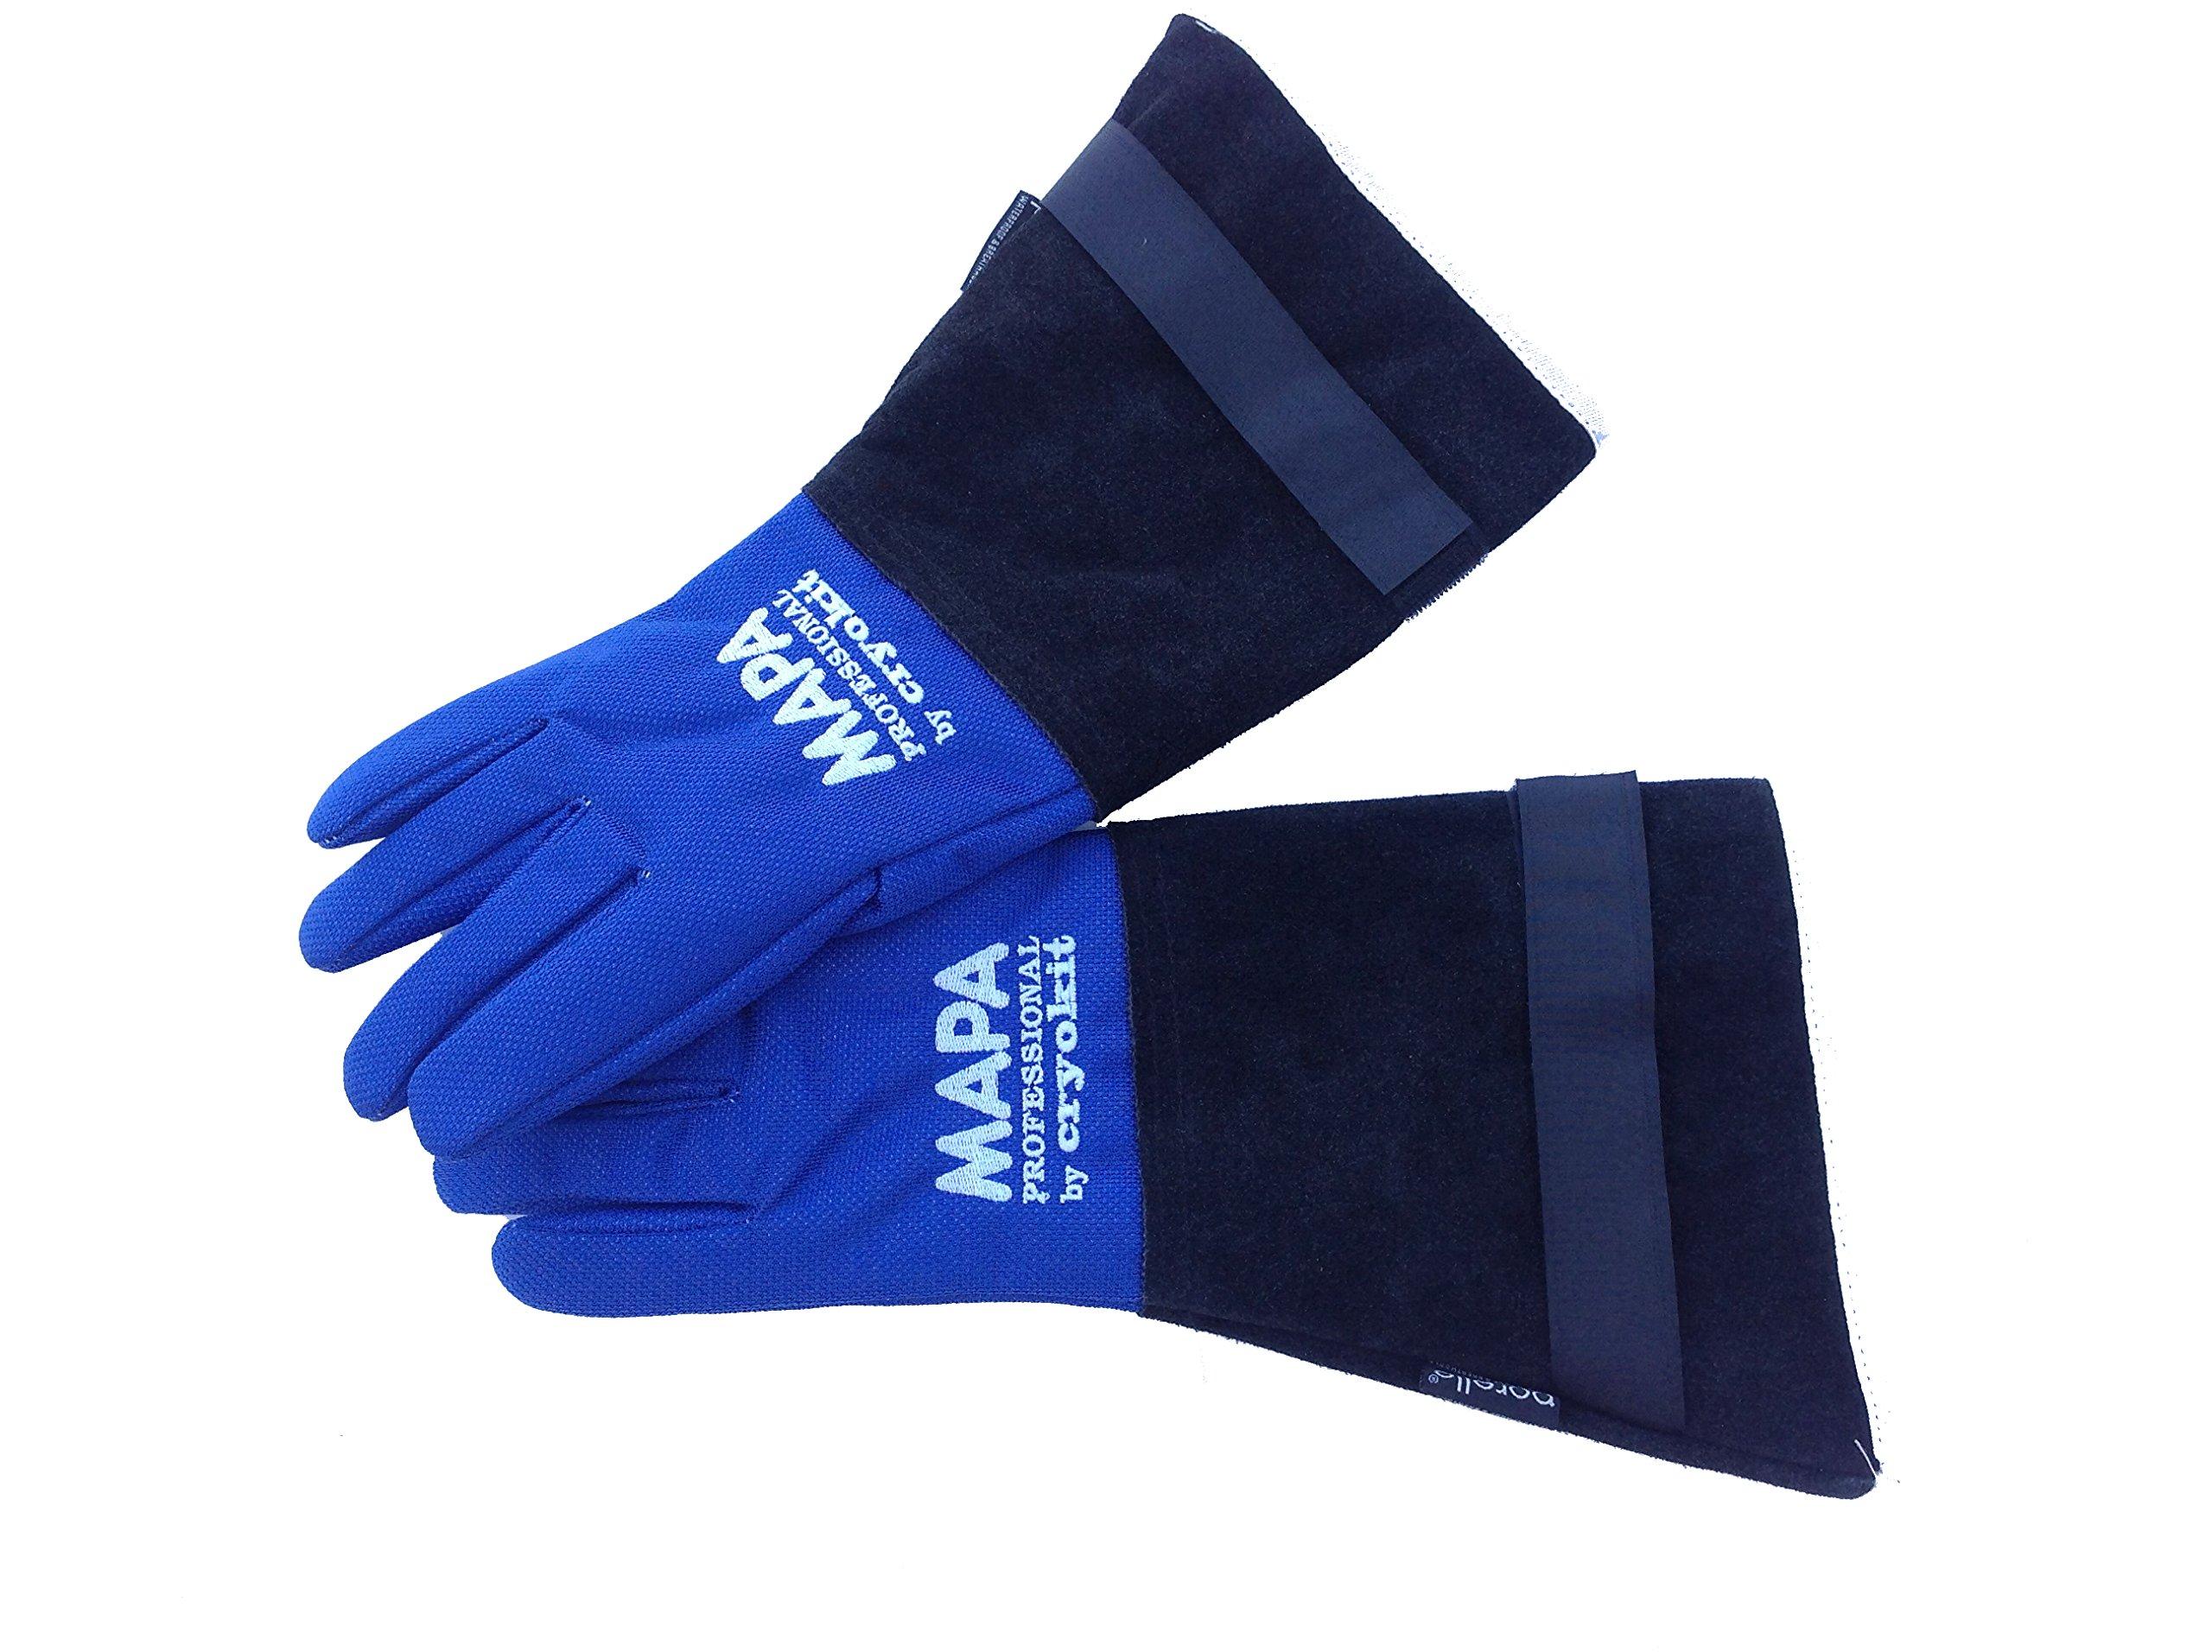 MAPA Professional CRYPLS203810 CRYOPLUS-2.0 Cryogenic Glove, (15''-LA), Size 10, PR 1, Blue